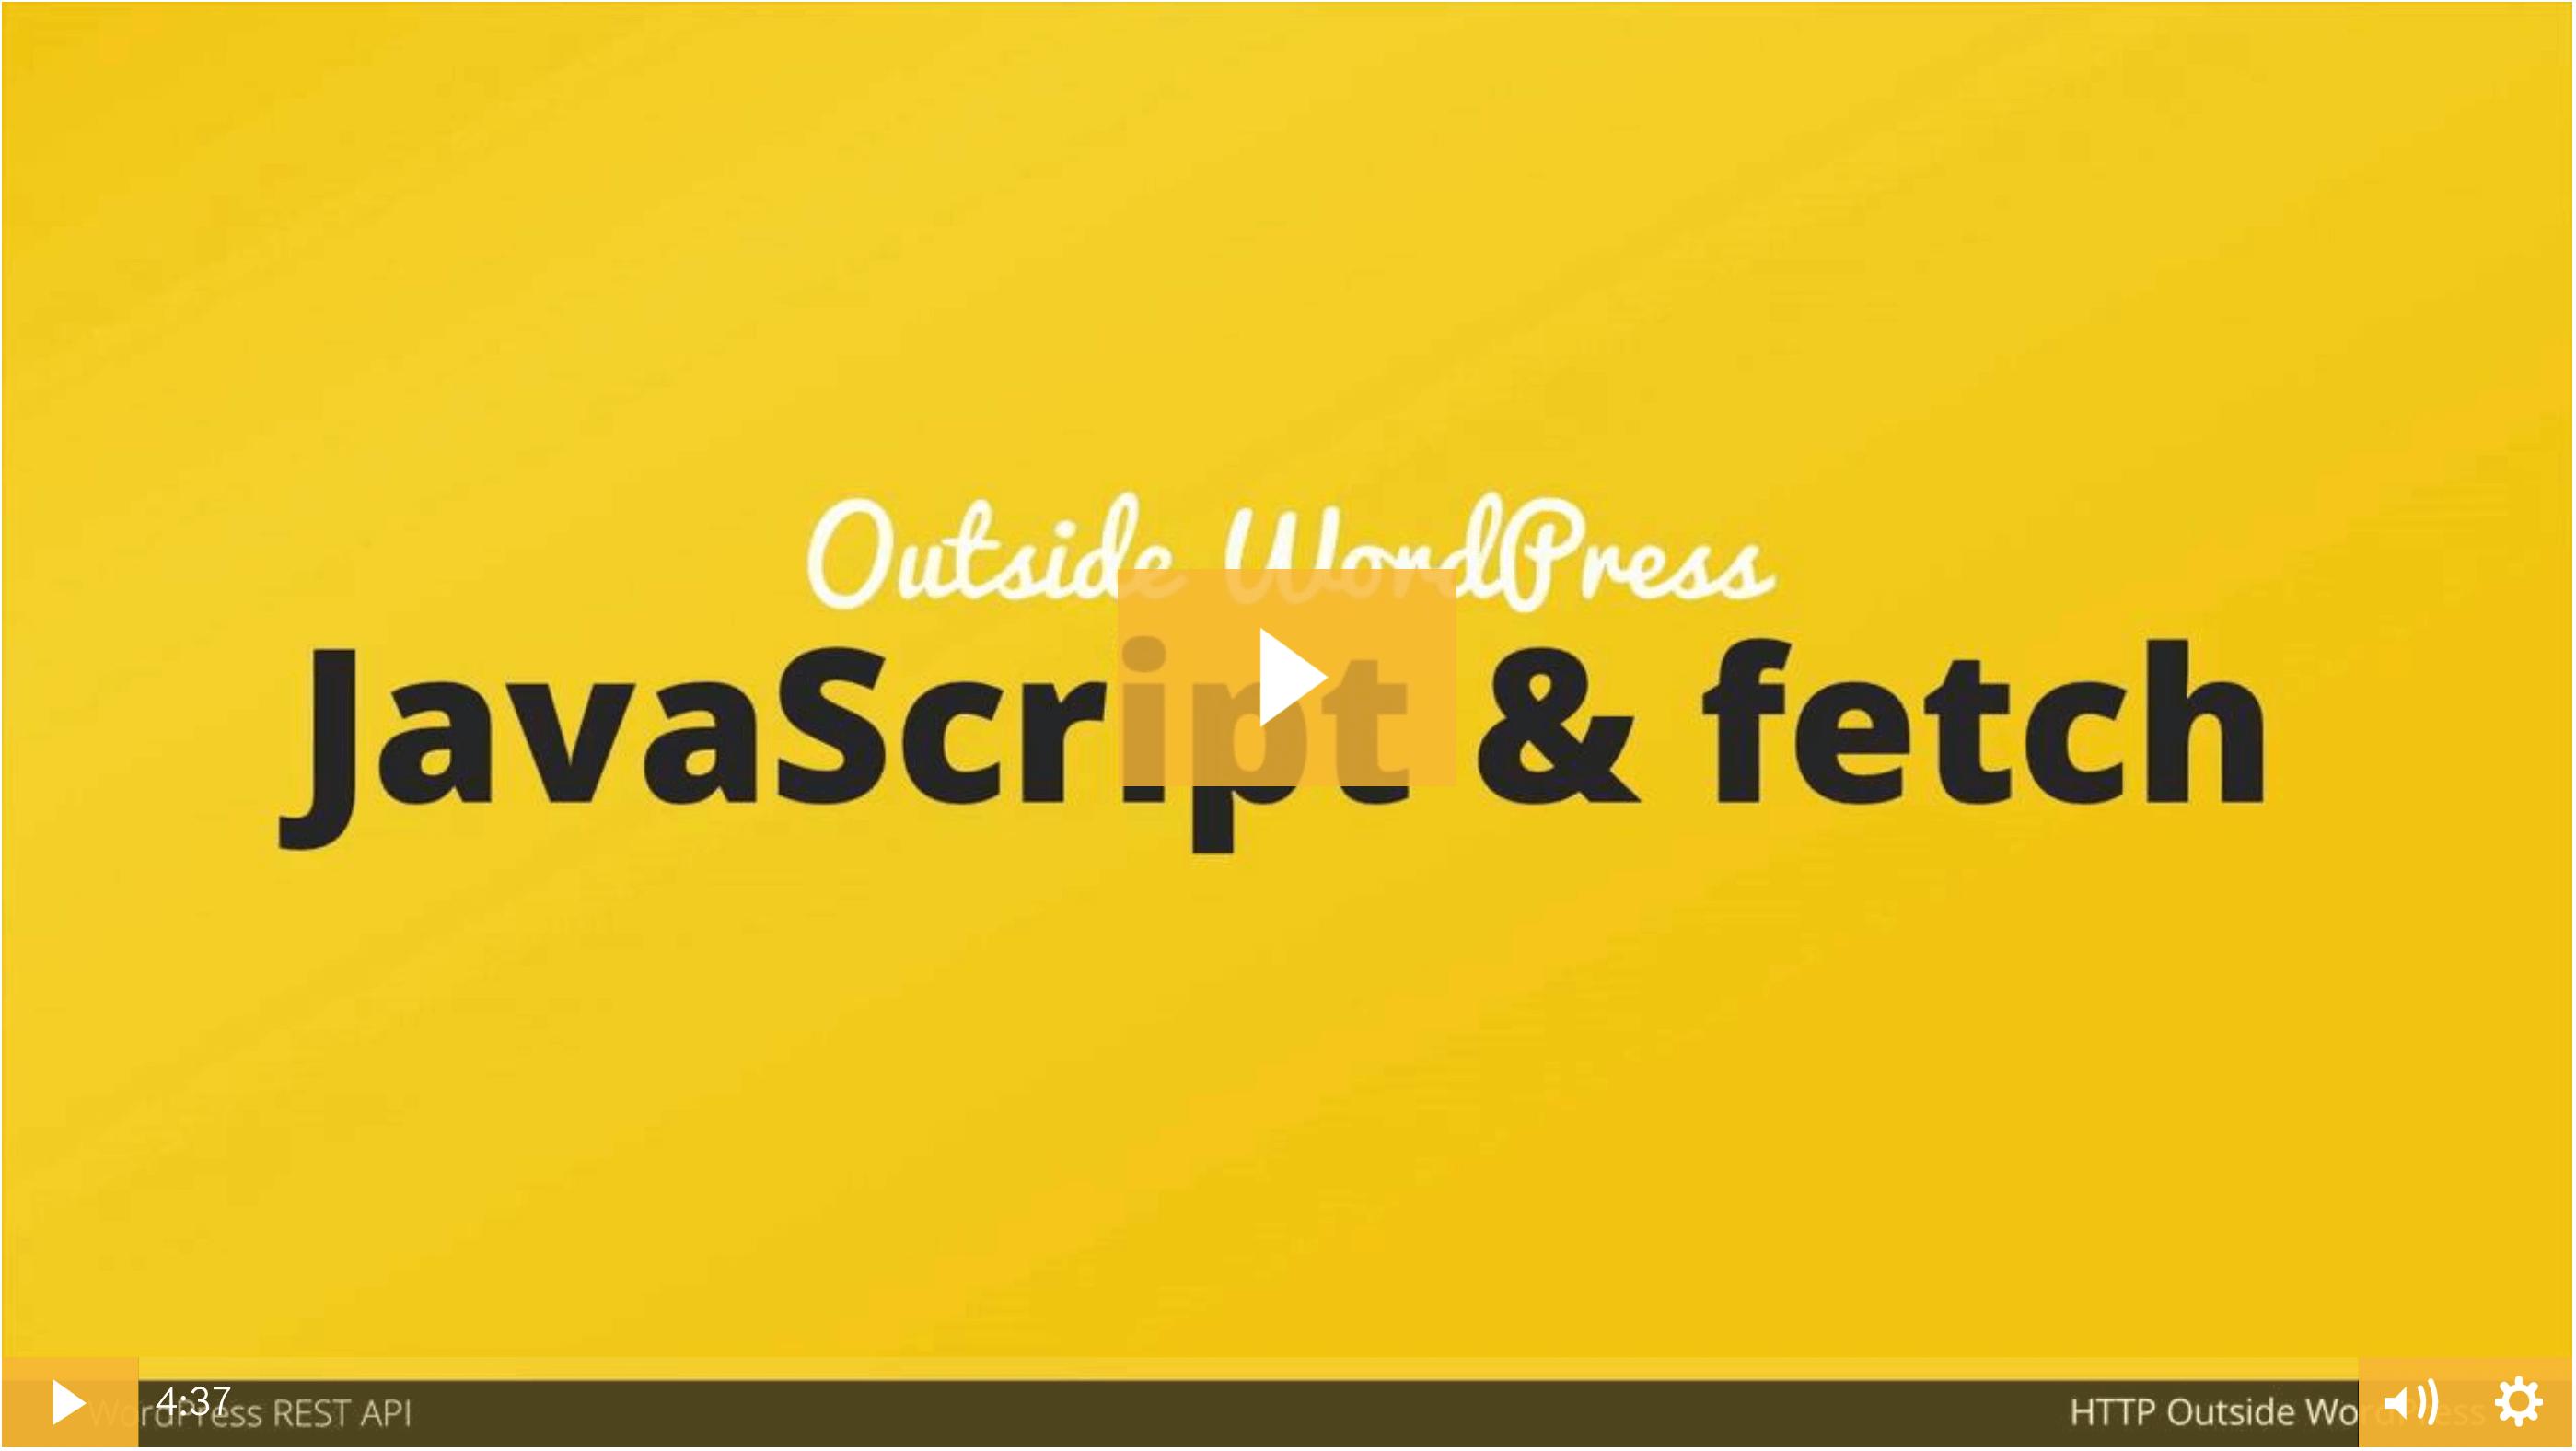 Decoupled WordPress REST API Calls with Vanilla JavaScript